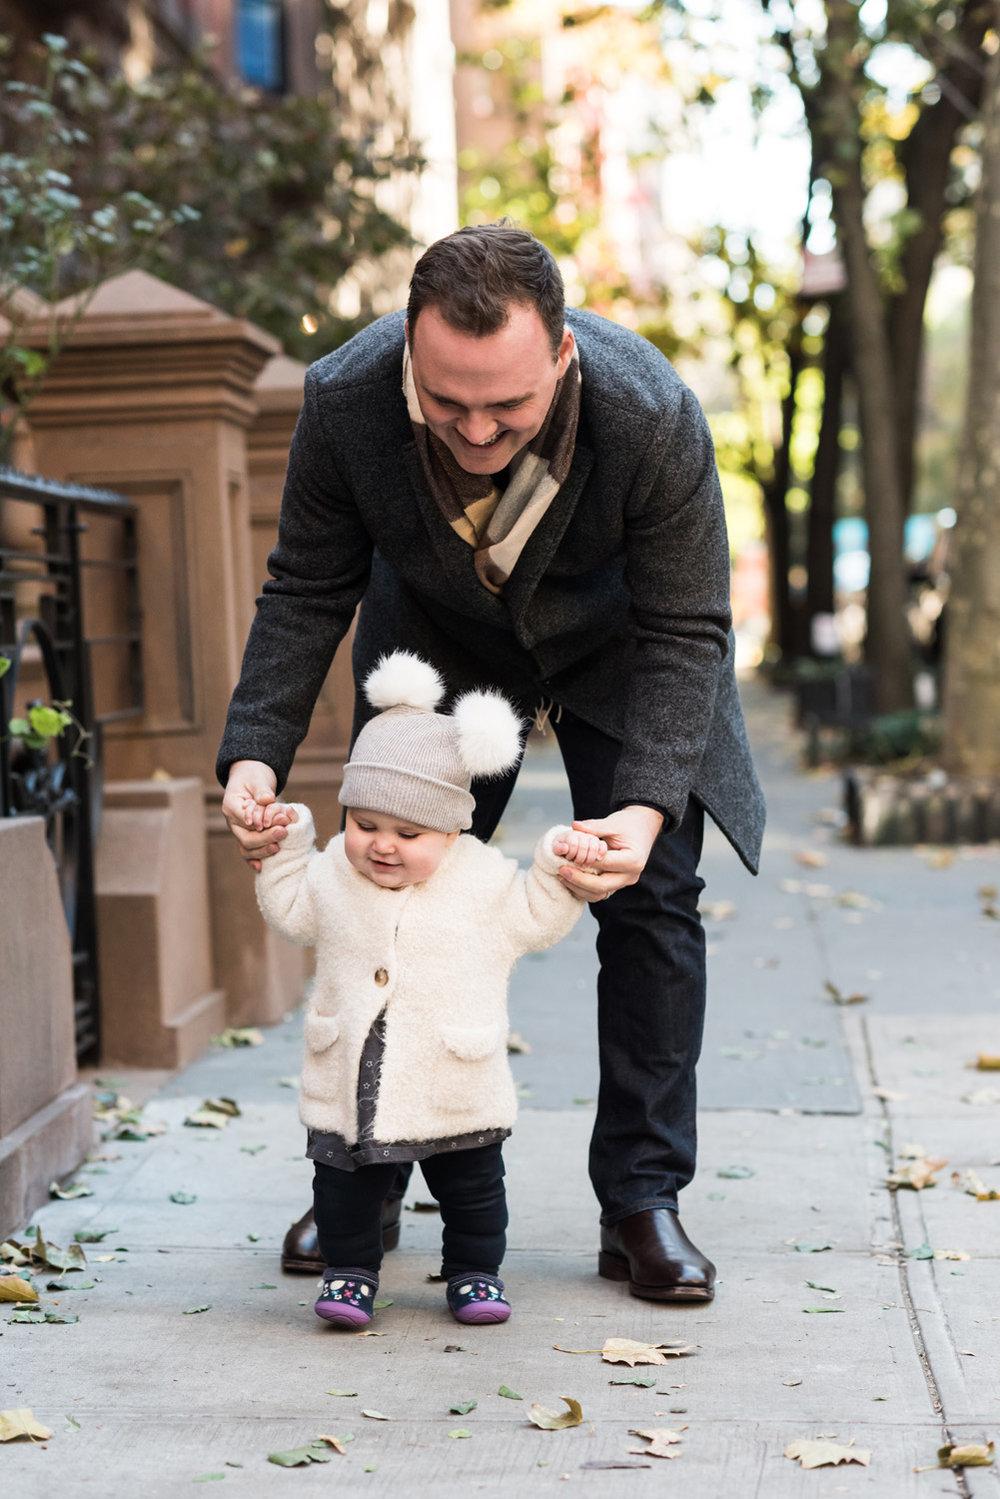 nyc family photographer-11112017_54.jpg